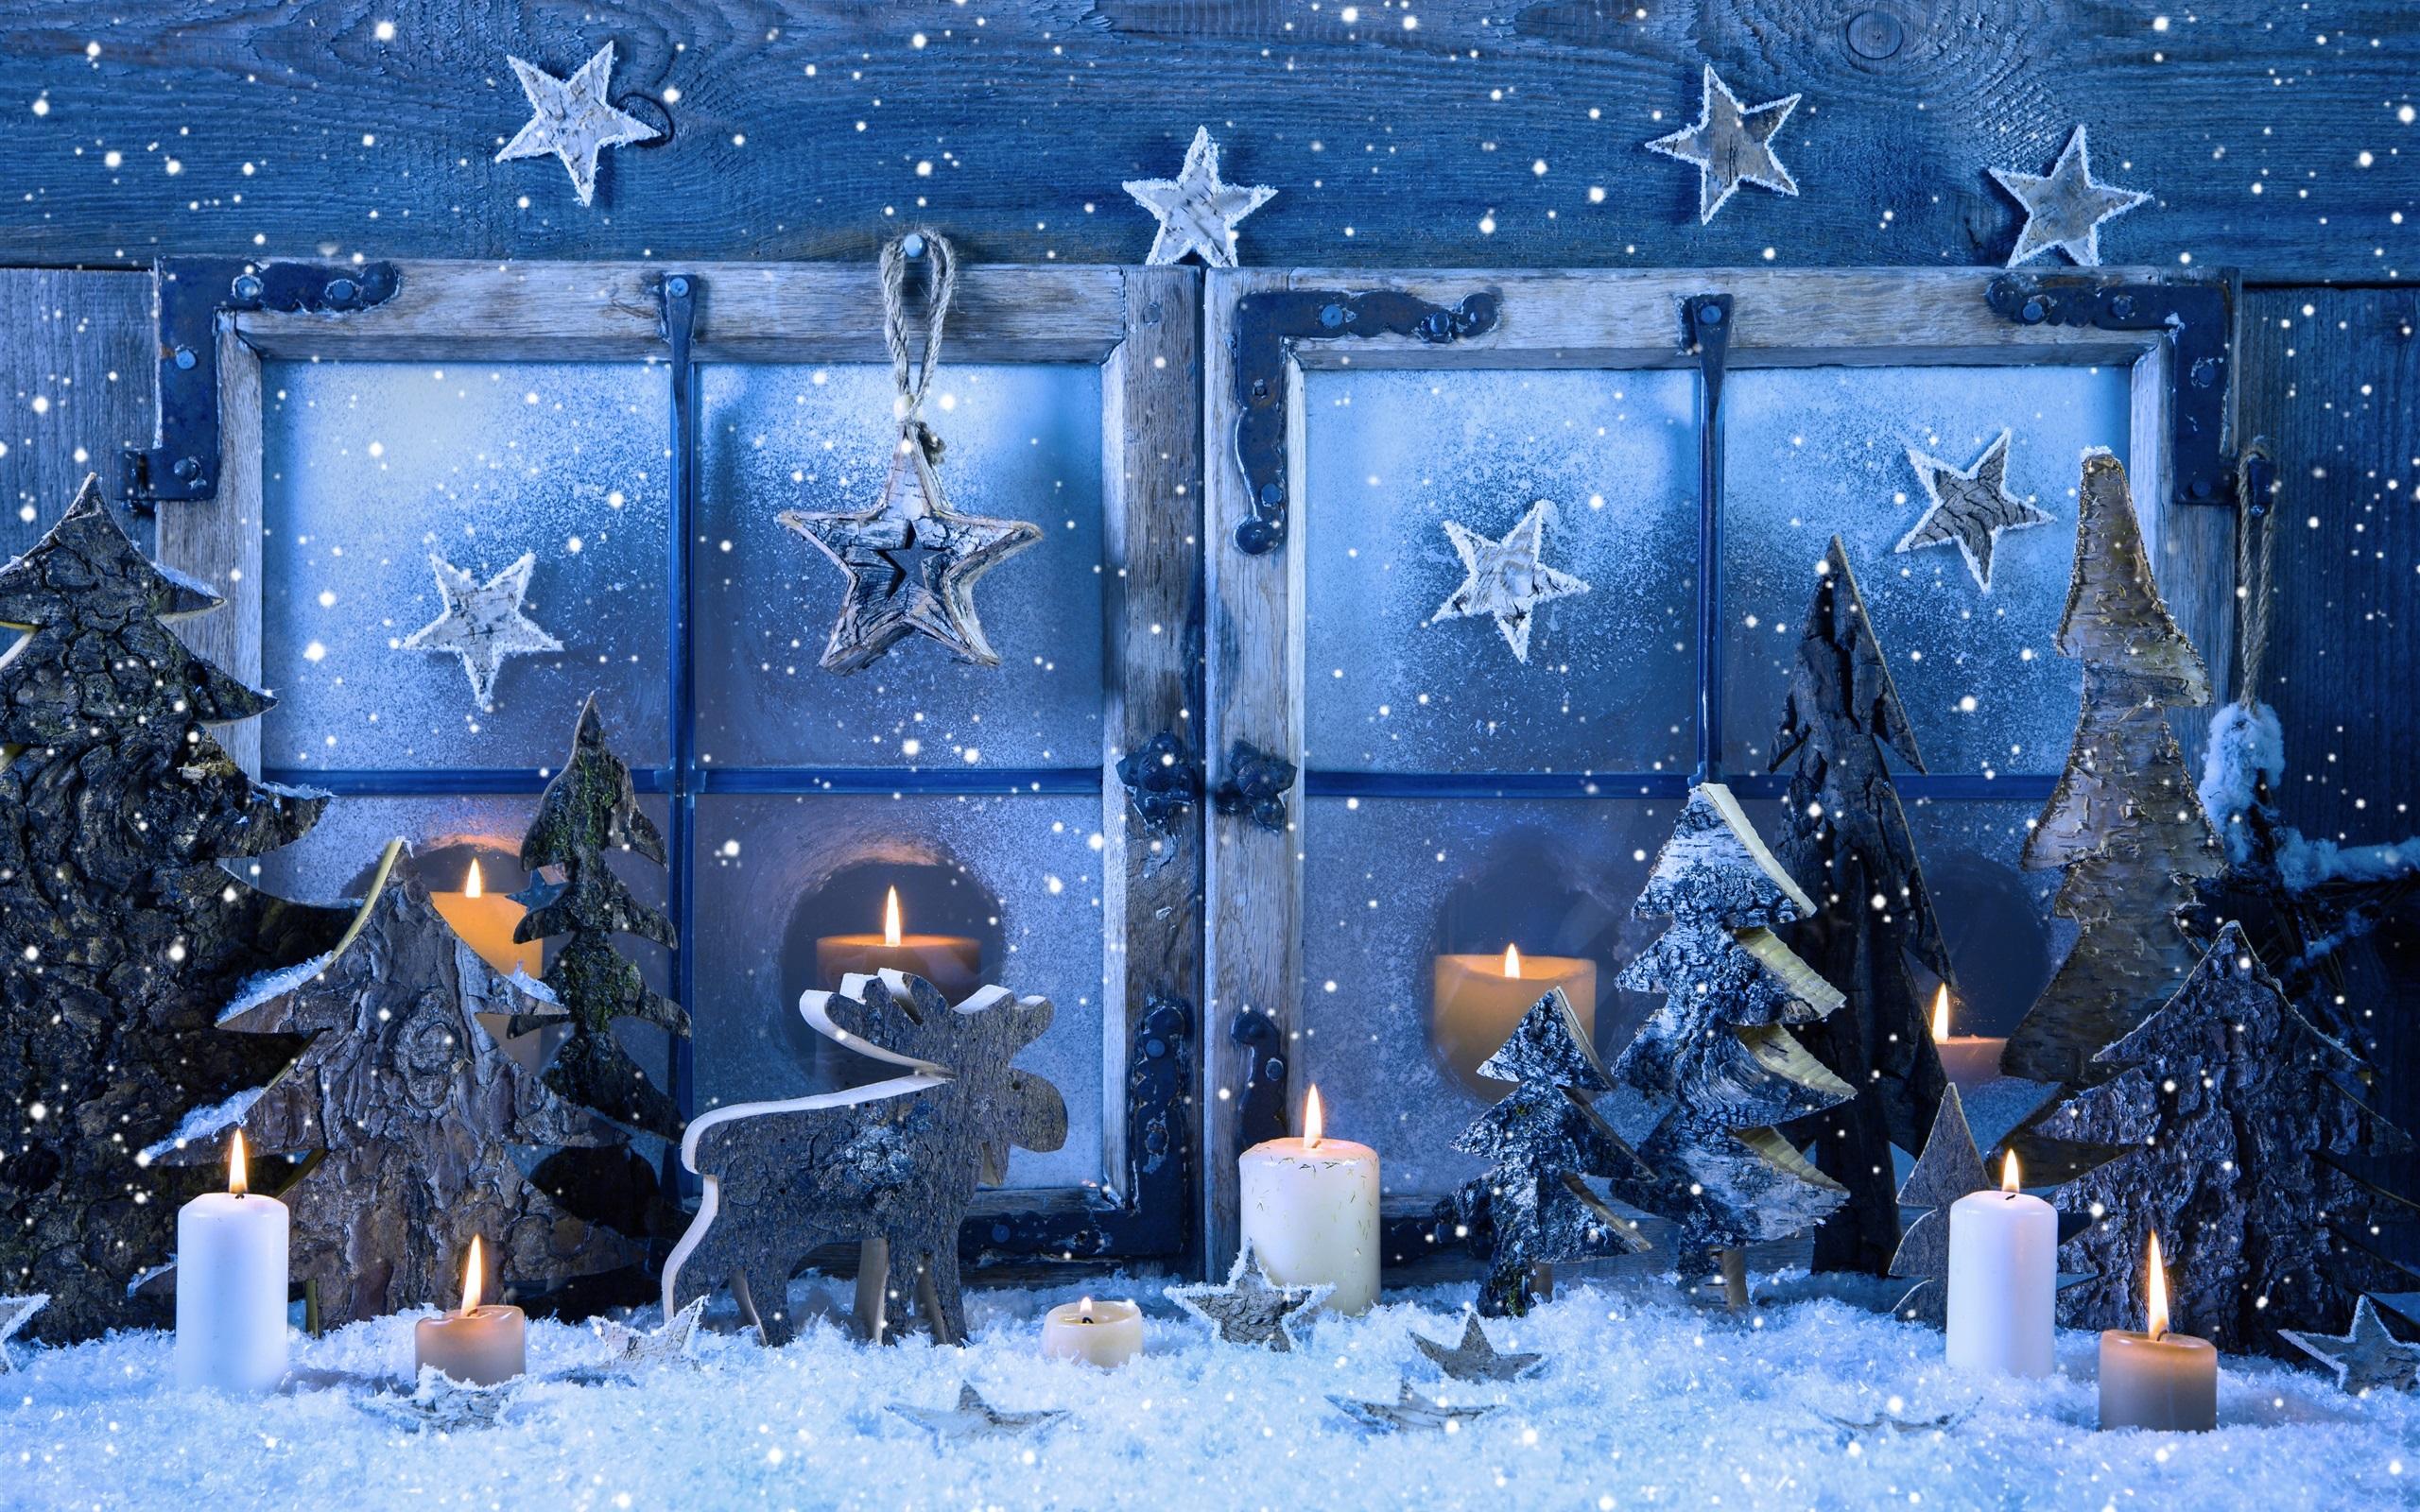 Frohe weihnachten fenster schneeflocken kerzen winter - Decoration de fenetre pour noel ...